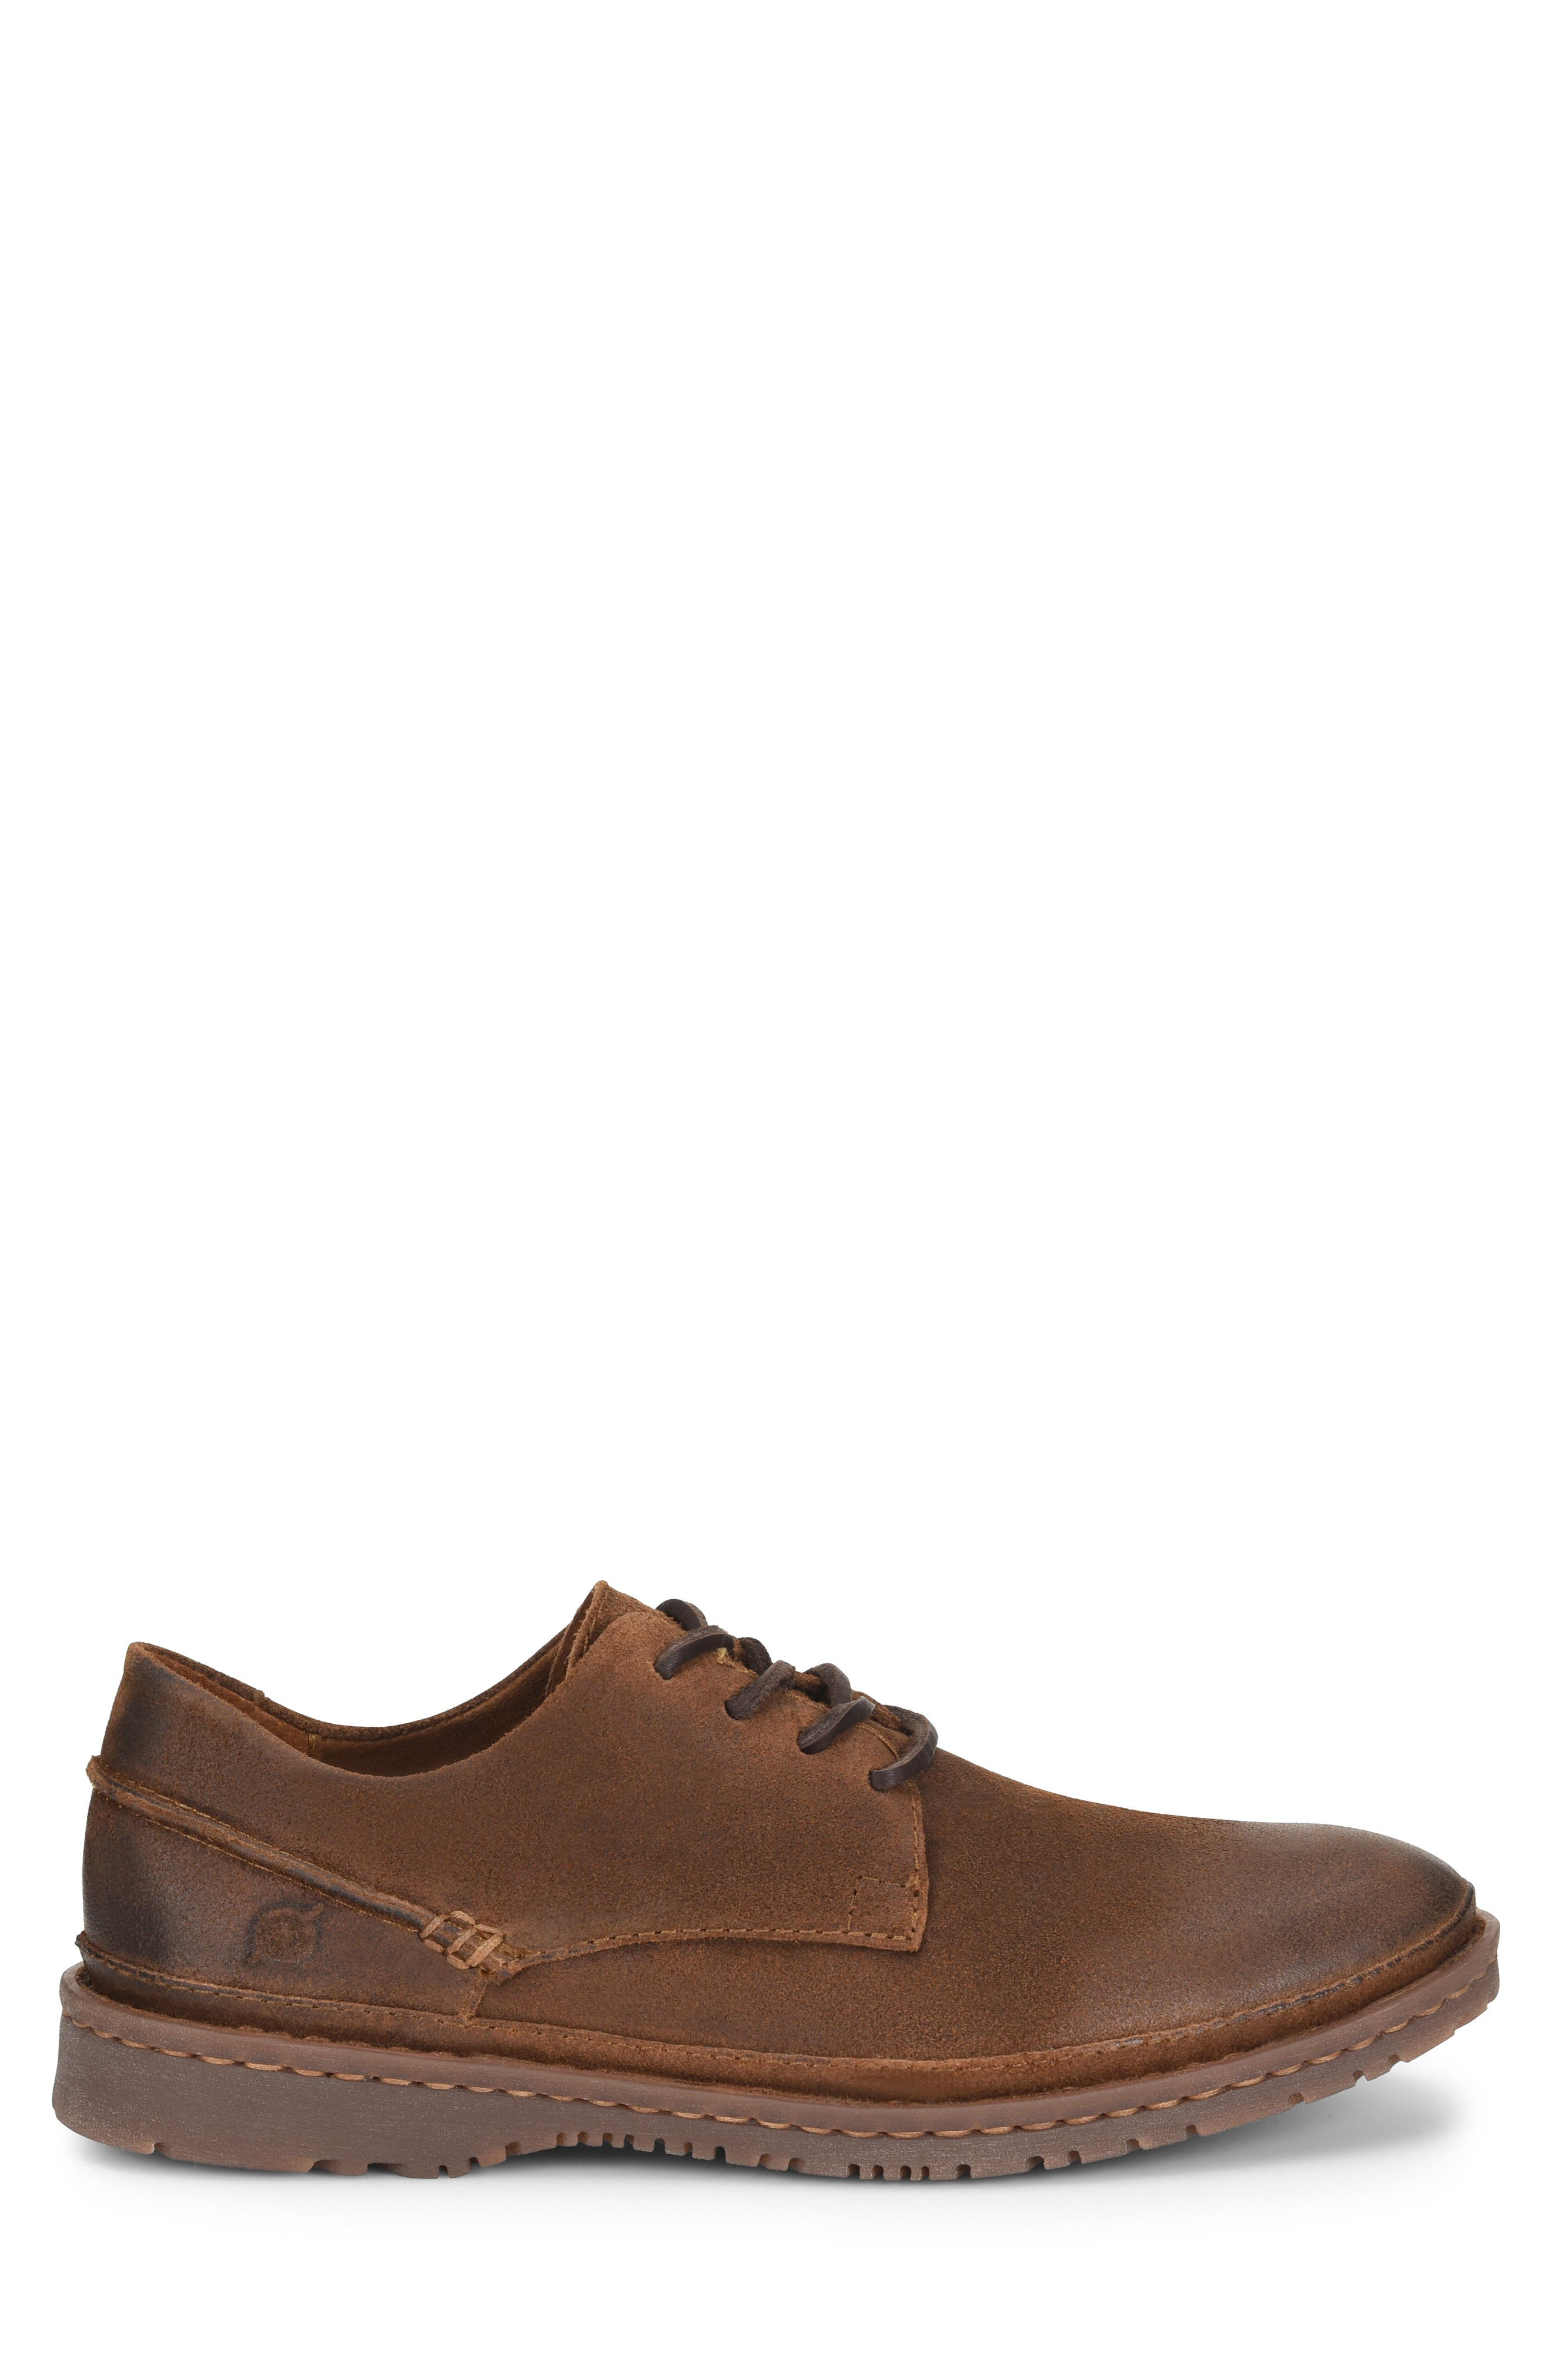 Gilles Plain Toe Derby,                             Alternate thumbnail 5, color,                             Brown/Brown Leather